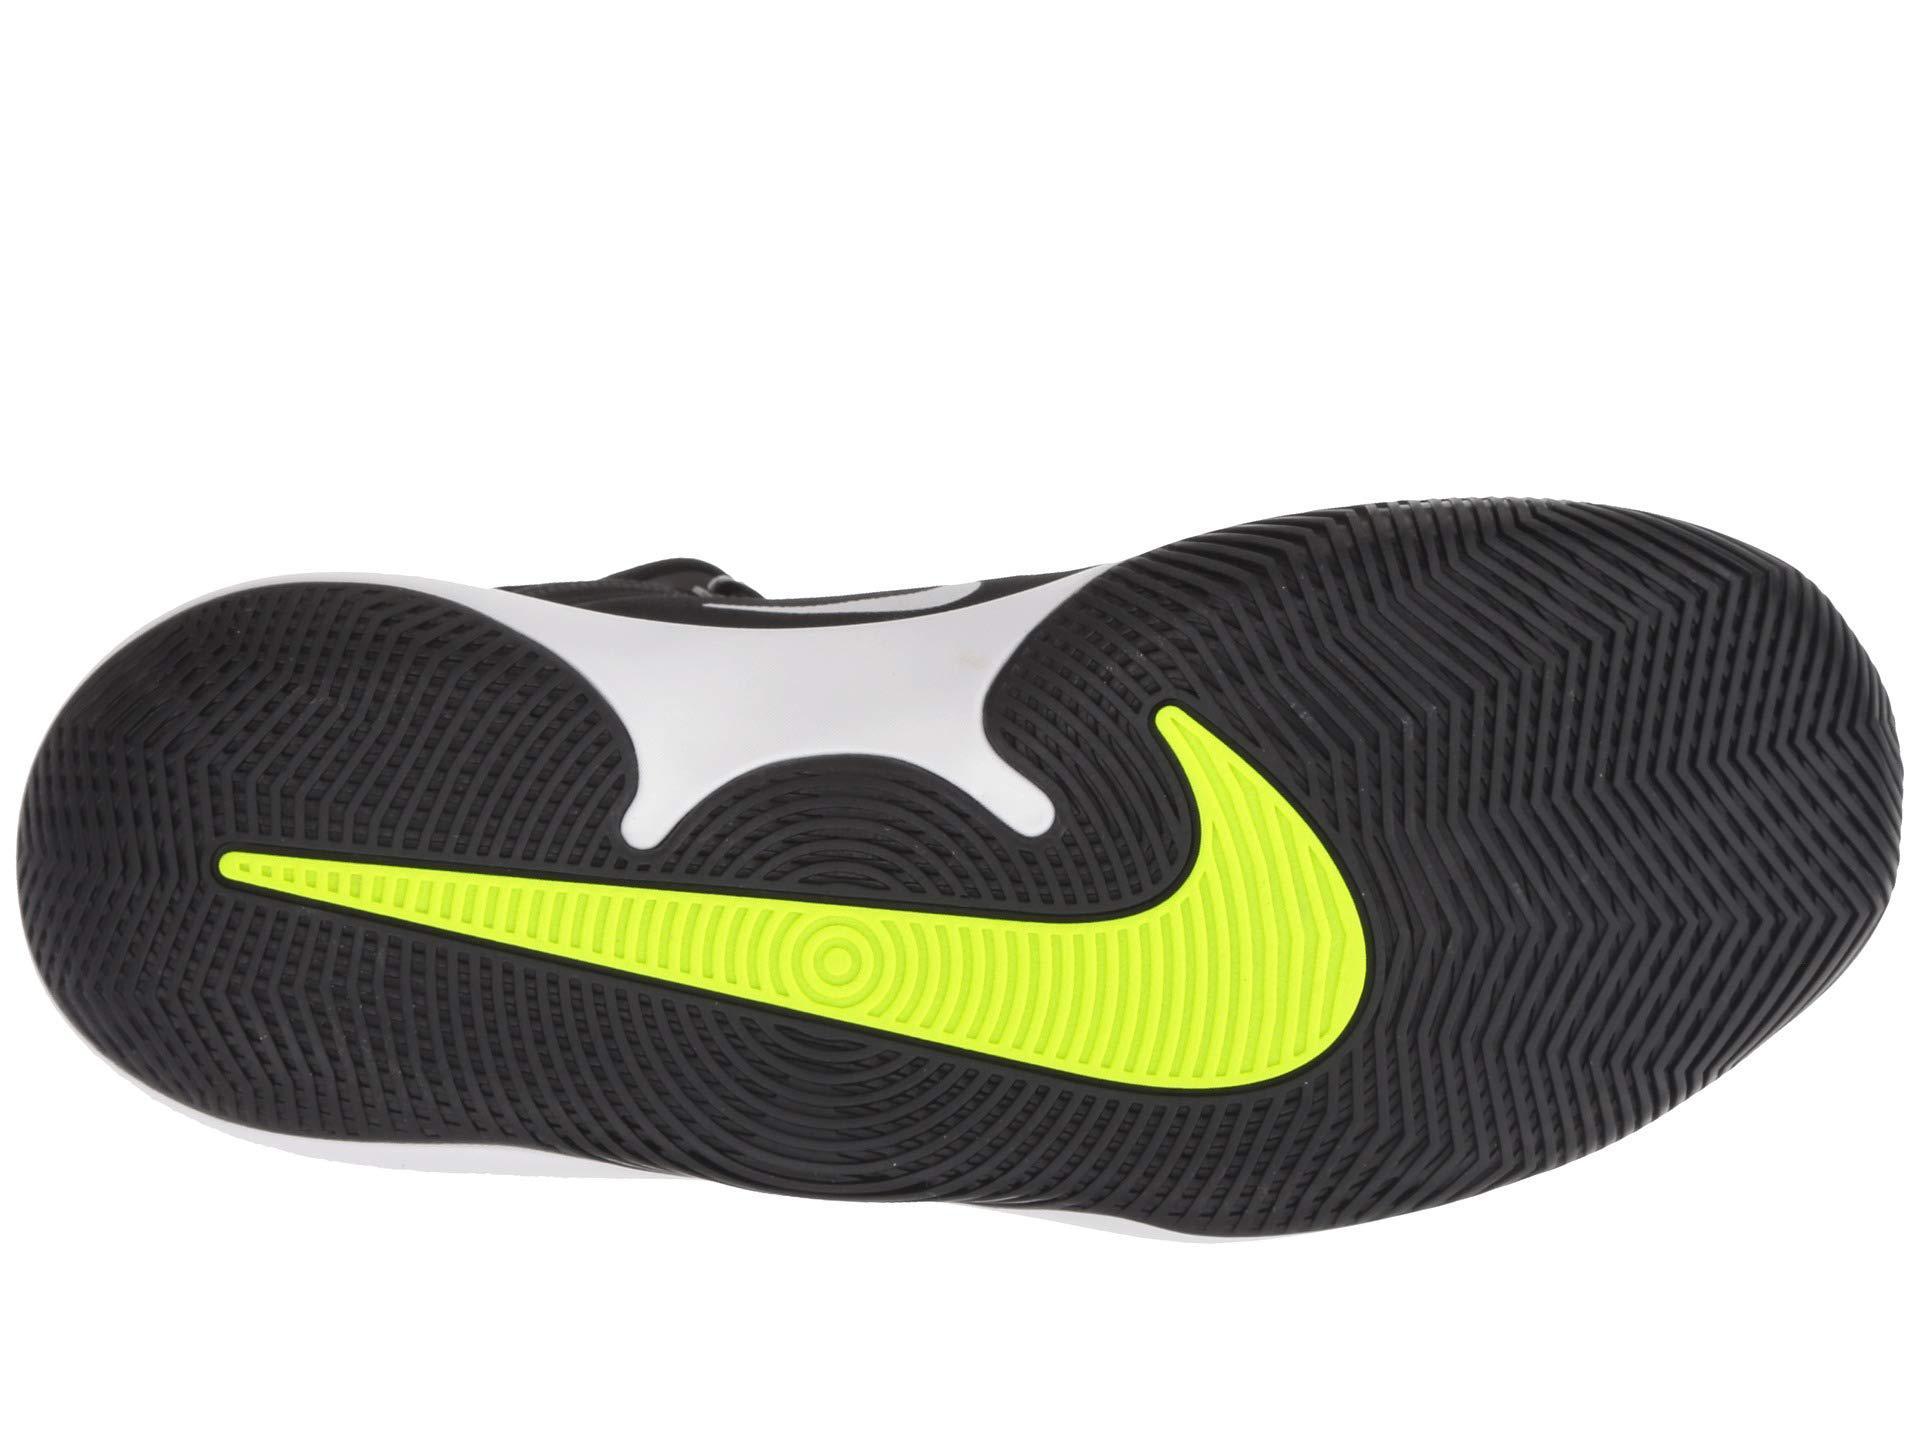 premium selection 02b6d 8754c Nike - Air Precision Ii Flyease (white/black/volt) Women's Basketball Shoes.  View fullscreen